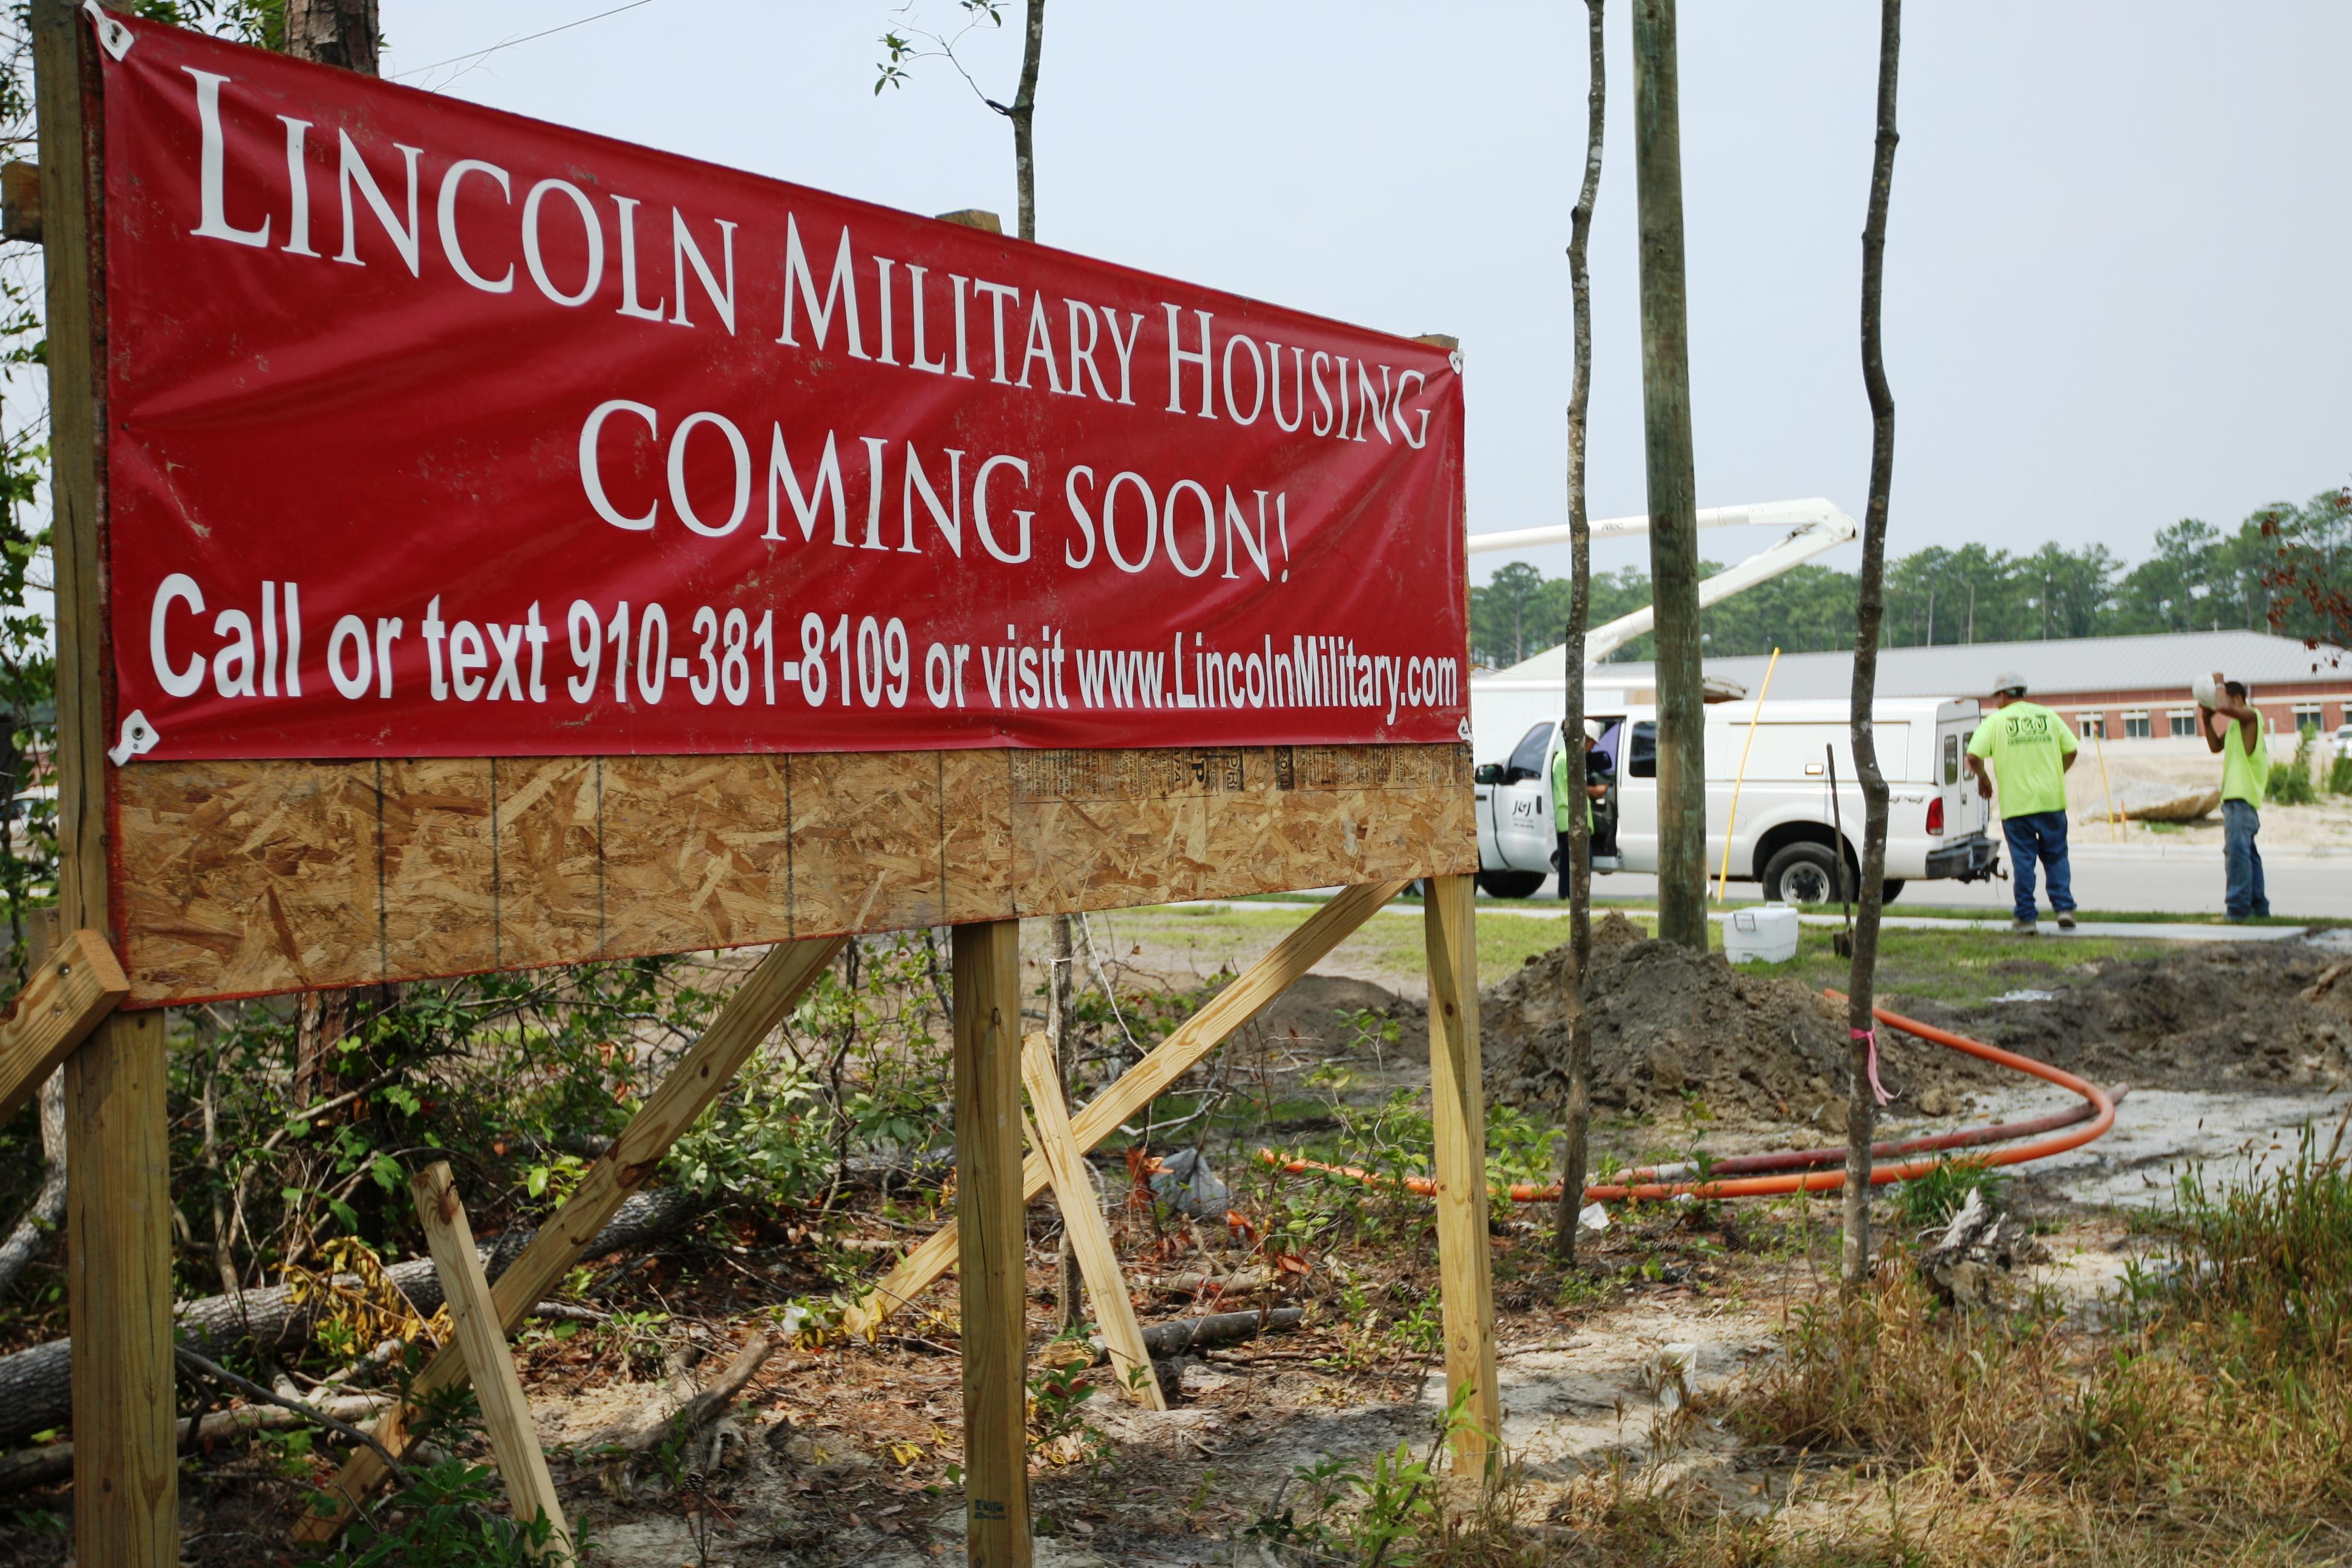 Camp lejeune photos for Lincoln motor company headquarters